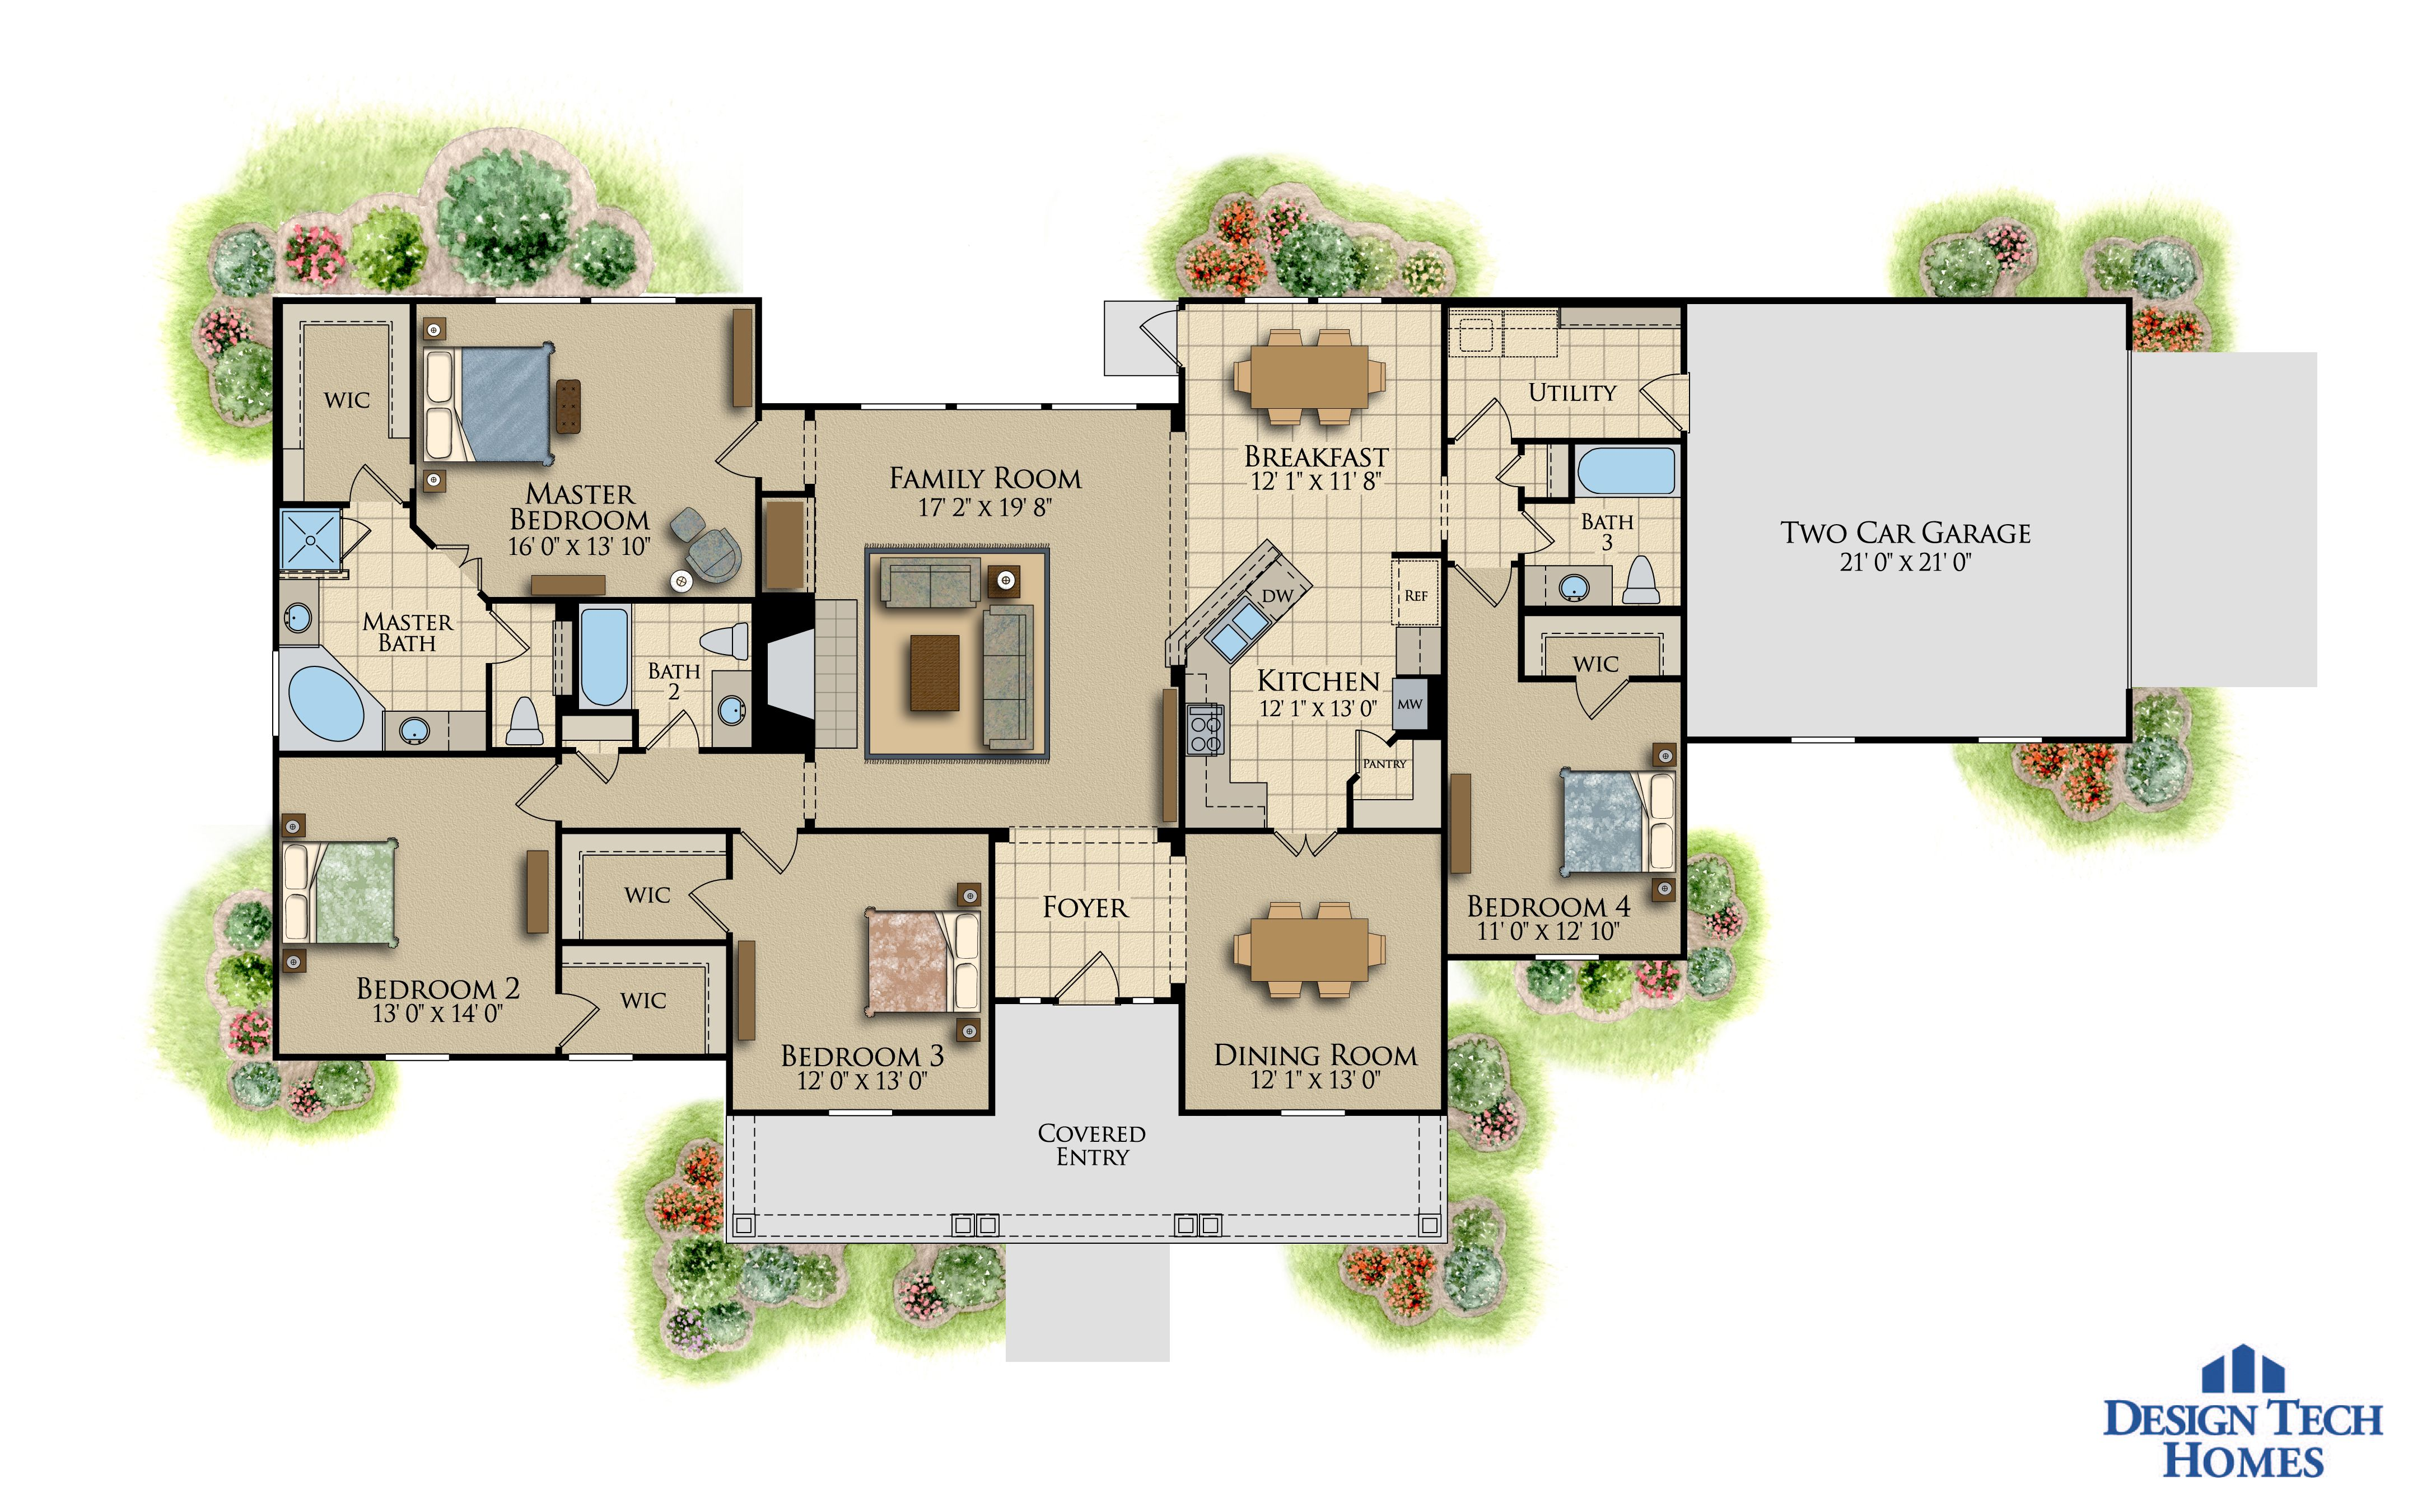 The Saddlebrook   Plus Sq Ft BOYL Floor Plans Design Tech Homes - Design tech homes pricing